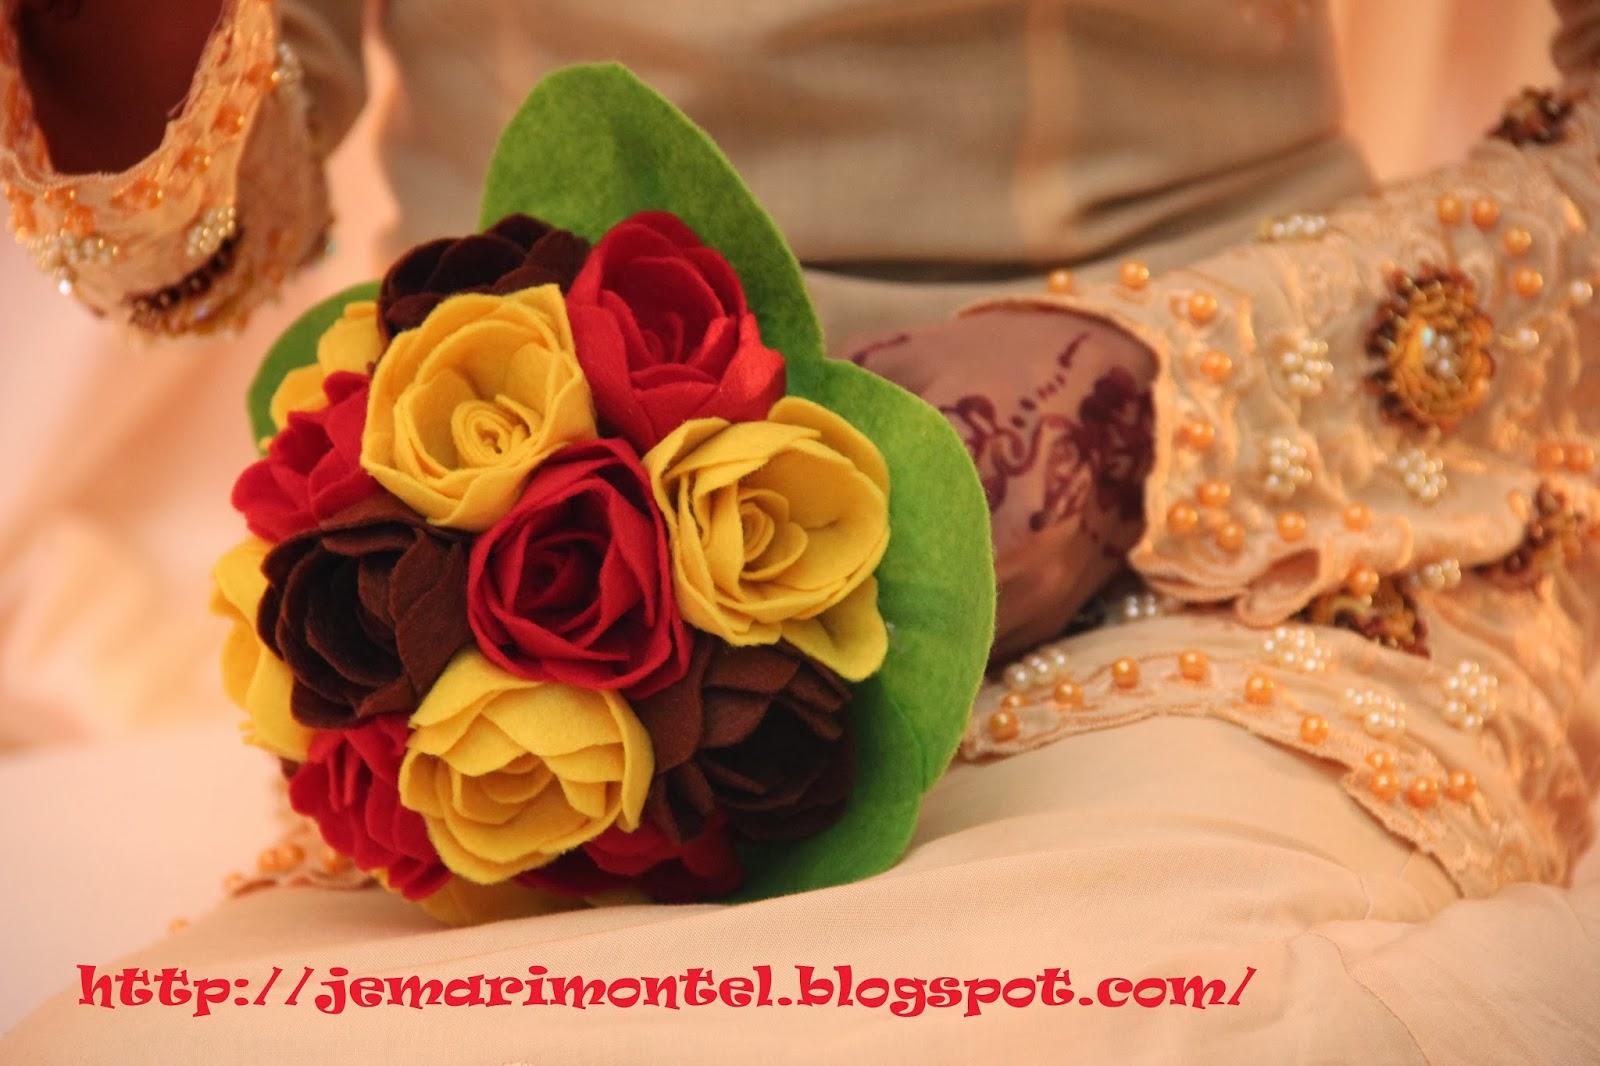 bunga tangan warna kuning, merah, coklat